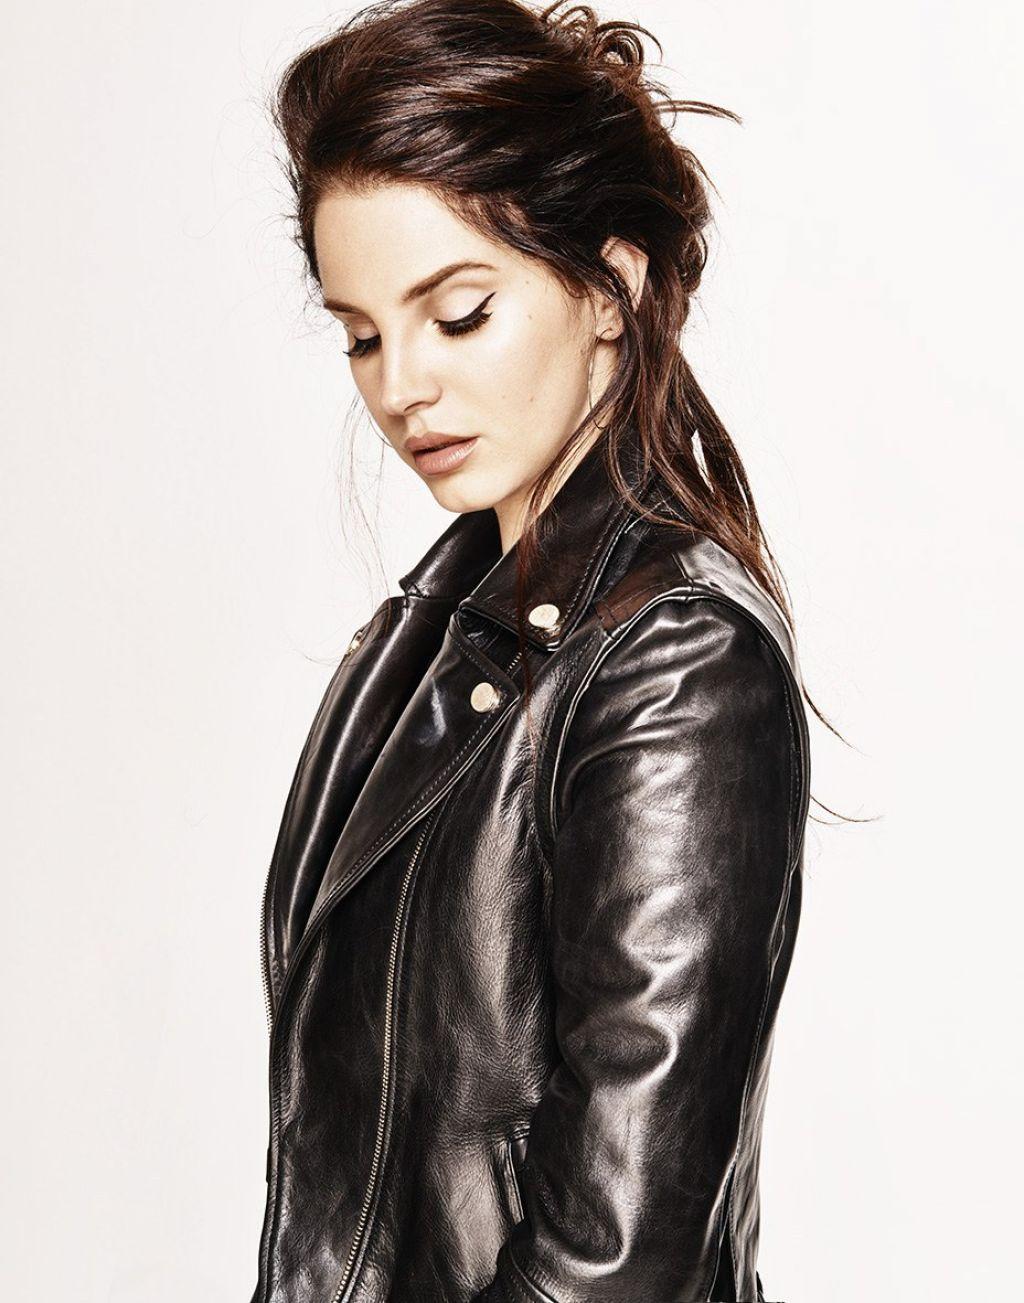 Leather jacket photoshoot - Image From Http Www Mendaily Com Wp Content Uploads 2012 10 Lana Del Rey By Ellen Von Unwerth Dark Paradise Vogue Italia August 2012 9 Jpg Pinterest